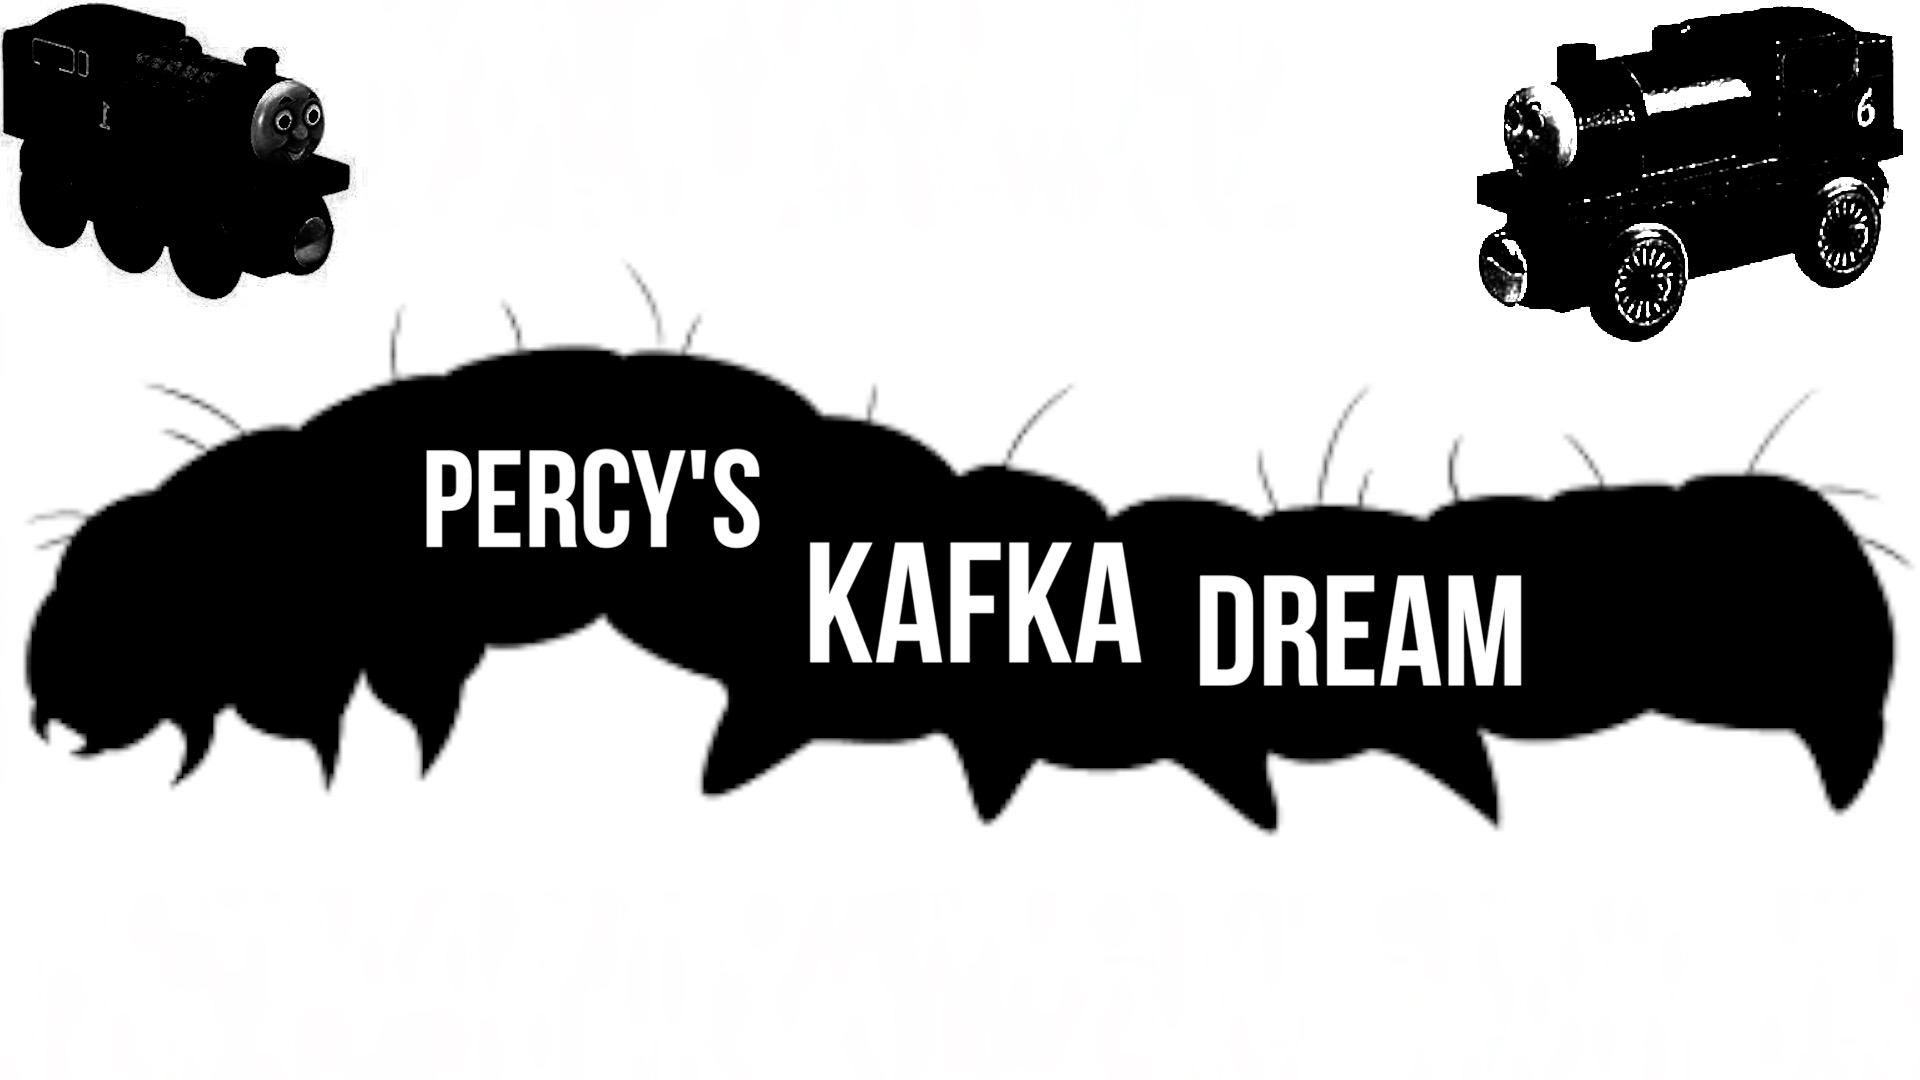 kafkas metamorphsis Gregor samsa: edward watson grete samsa: laura day mrs samsa: nina goldman mr samsa: anton skrzypiciel maid/coffee lady/dream figure/bearded man: bettina.